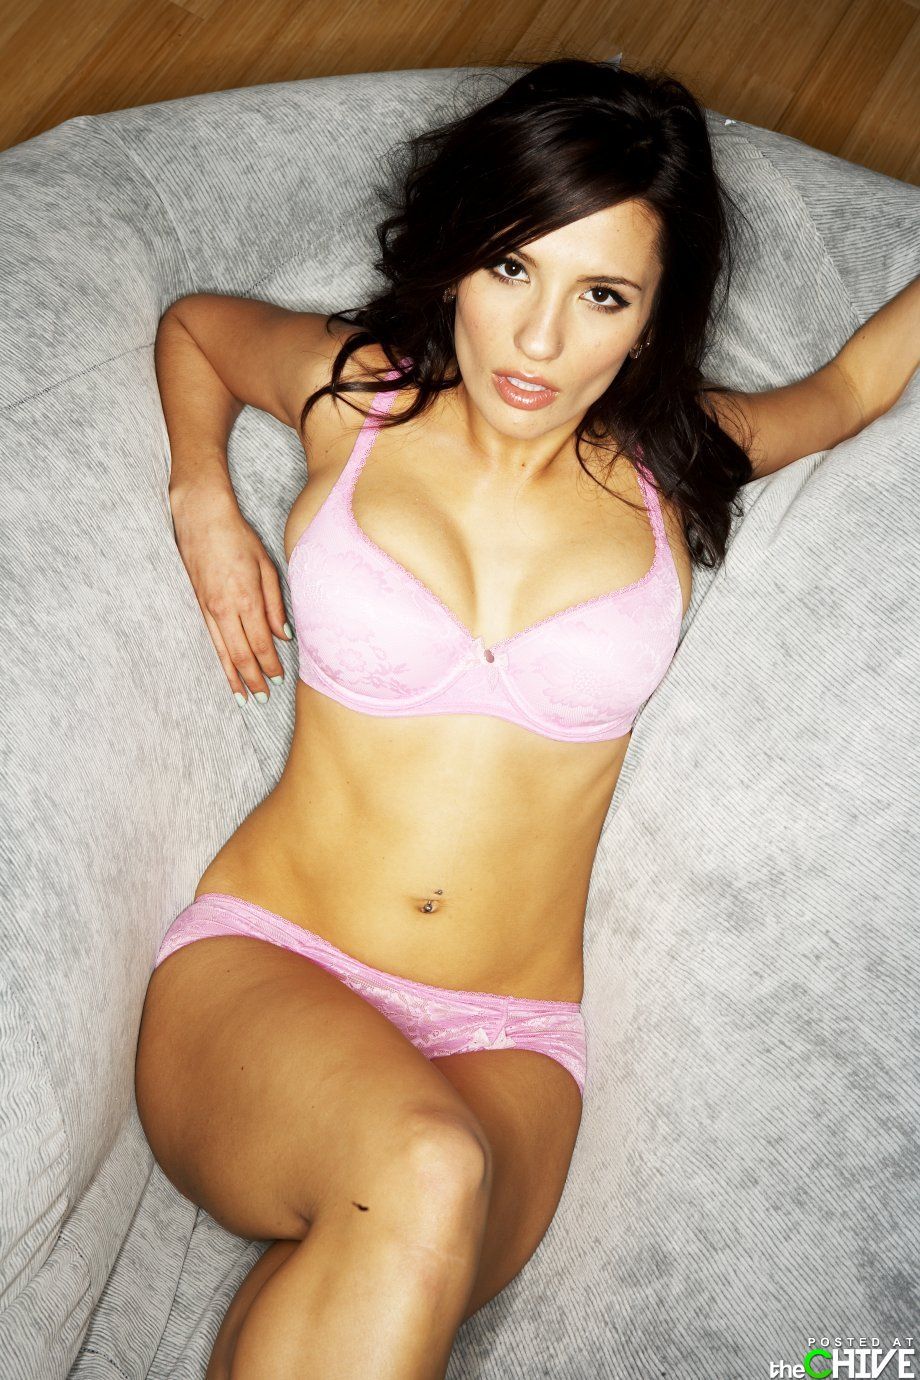 Snapchat Tillie Medland nude (75 photos), Ass, Sideboobs, Selfie, lingerie 2006